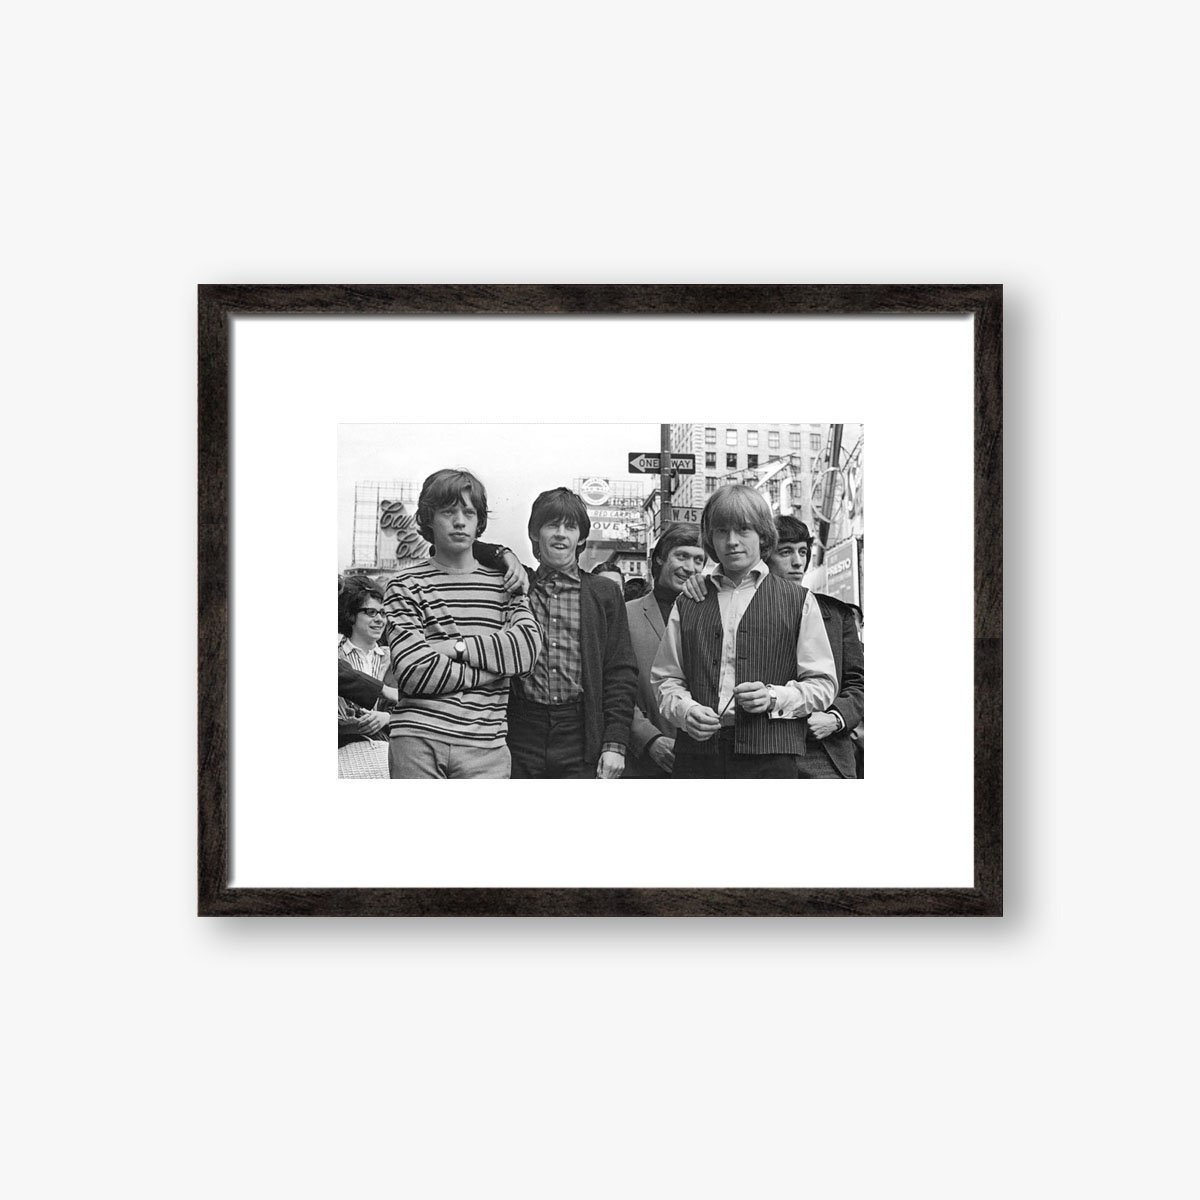 Rolling Stones In New York by Bill Lovelace